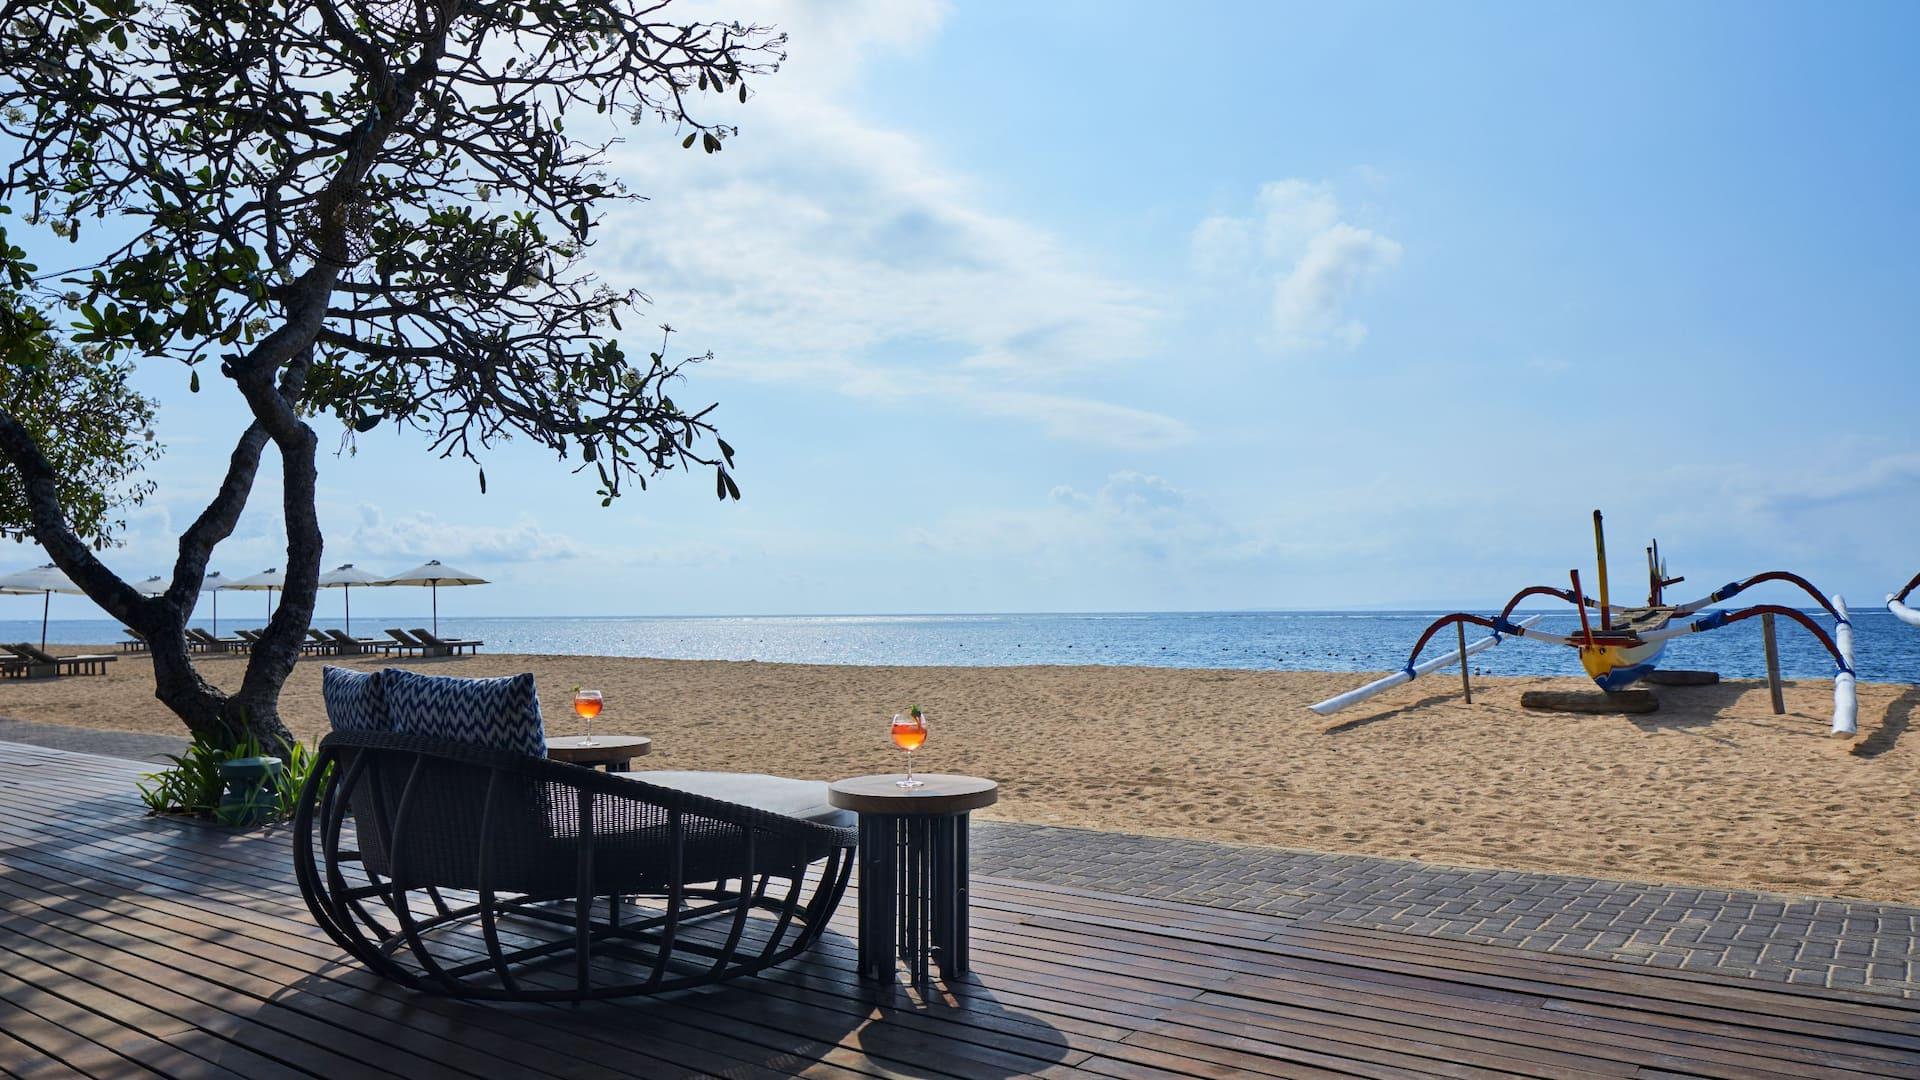 Hyatt Regency Bali Resort, Sanur Bali, Indonesia